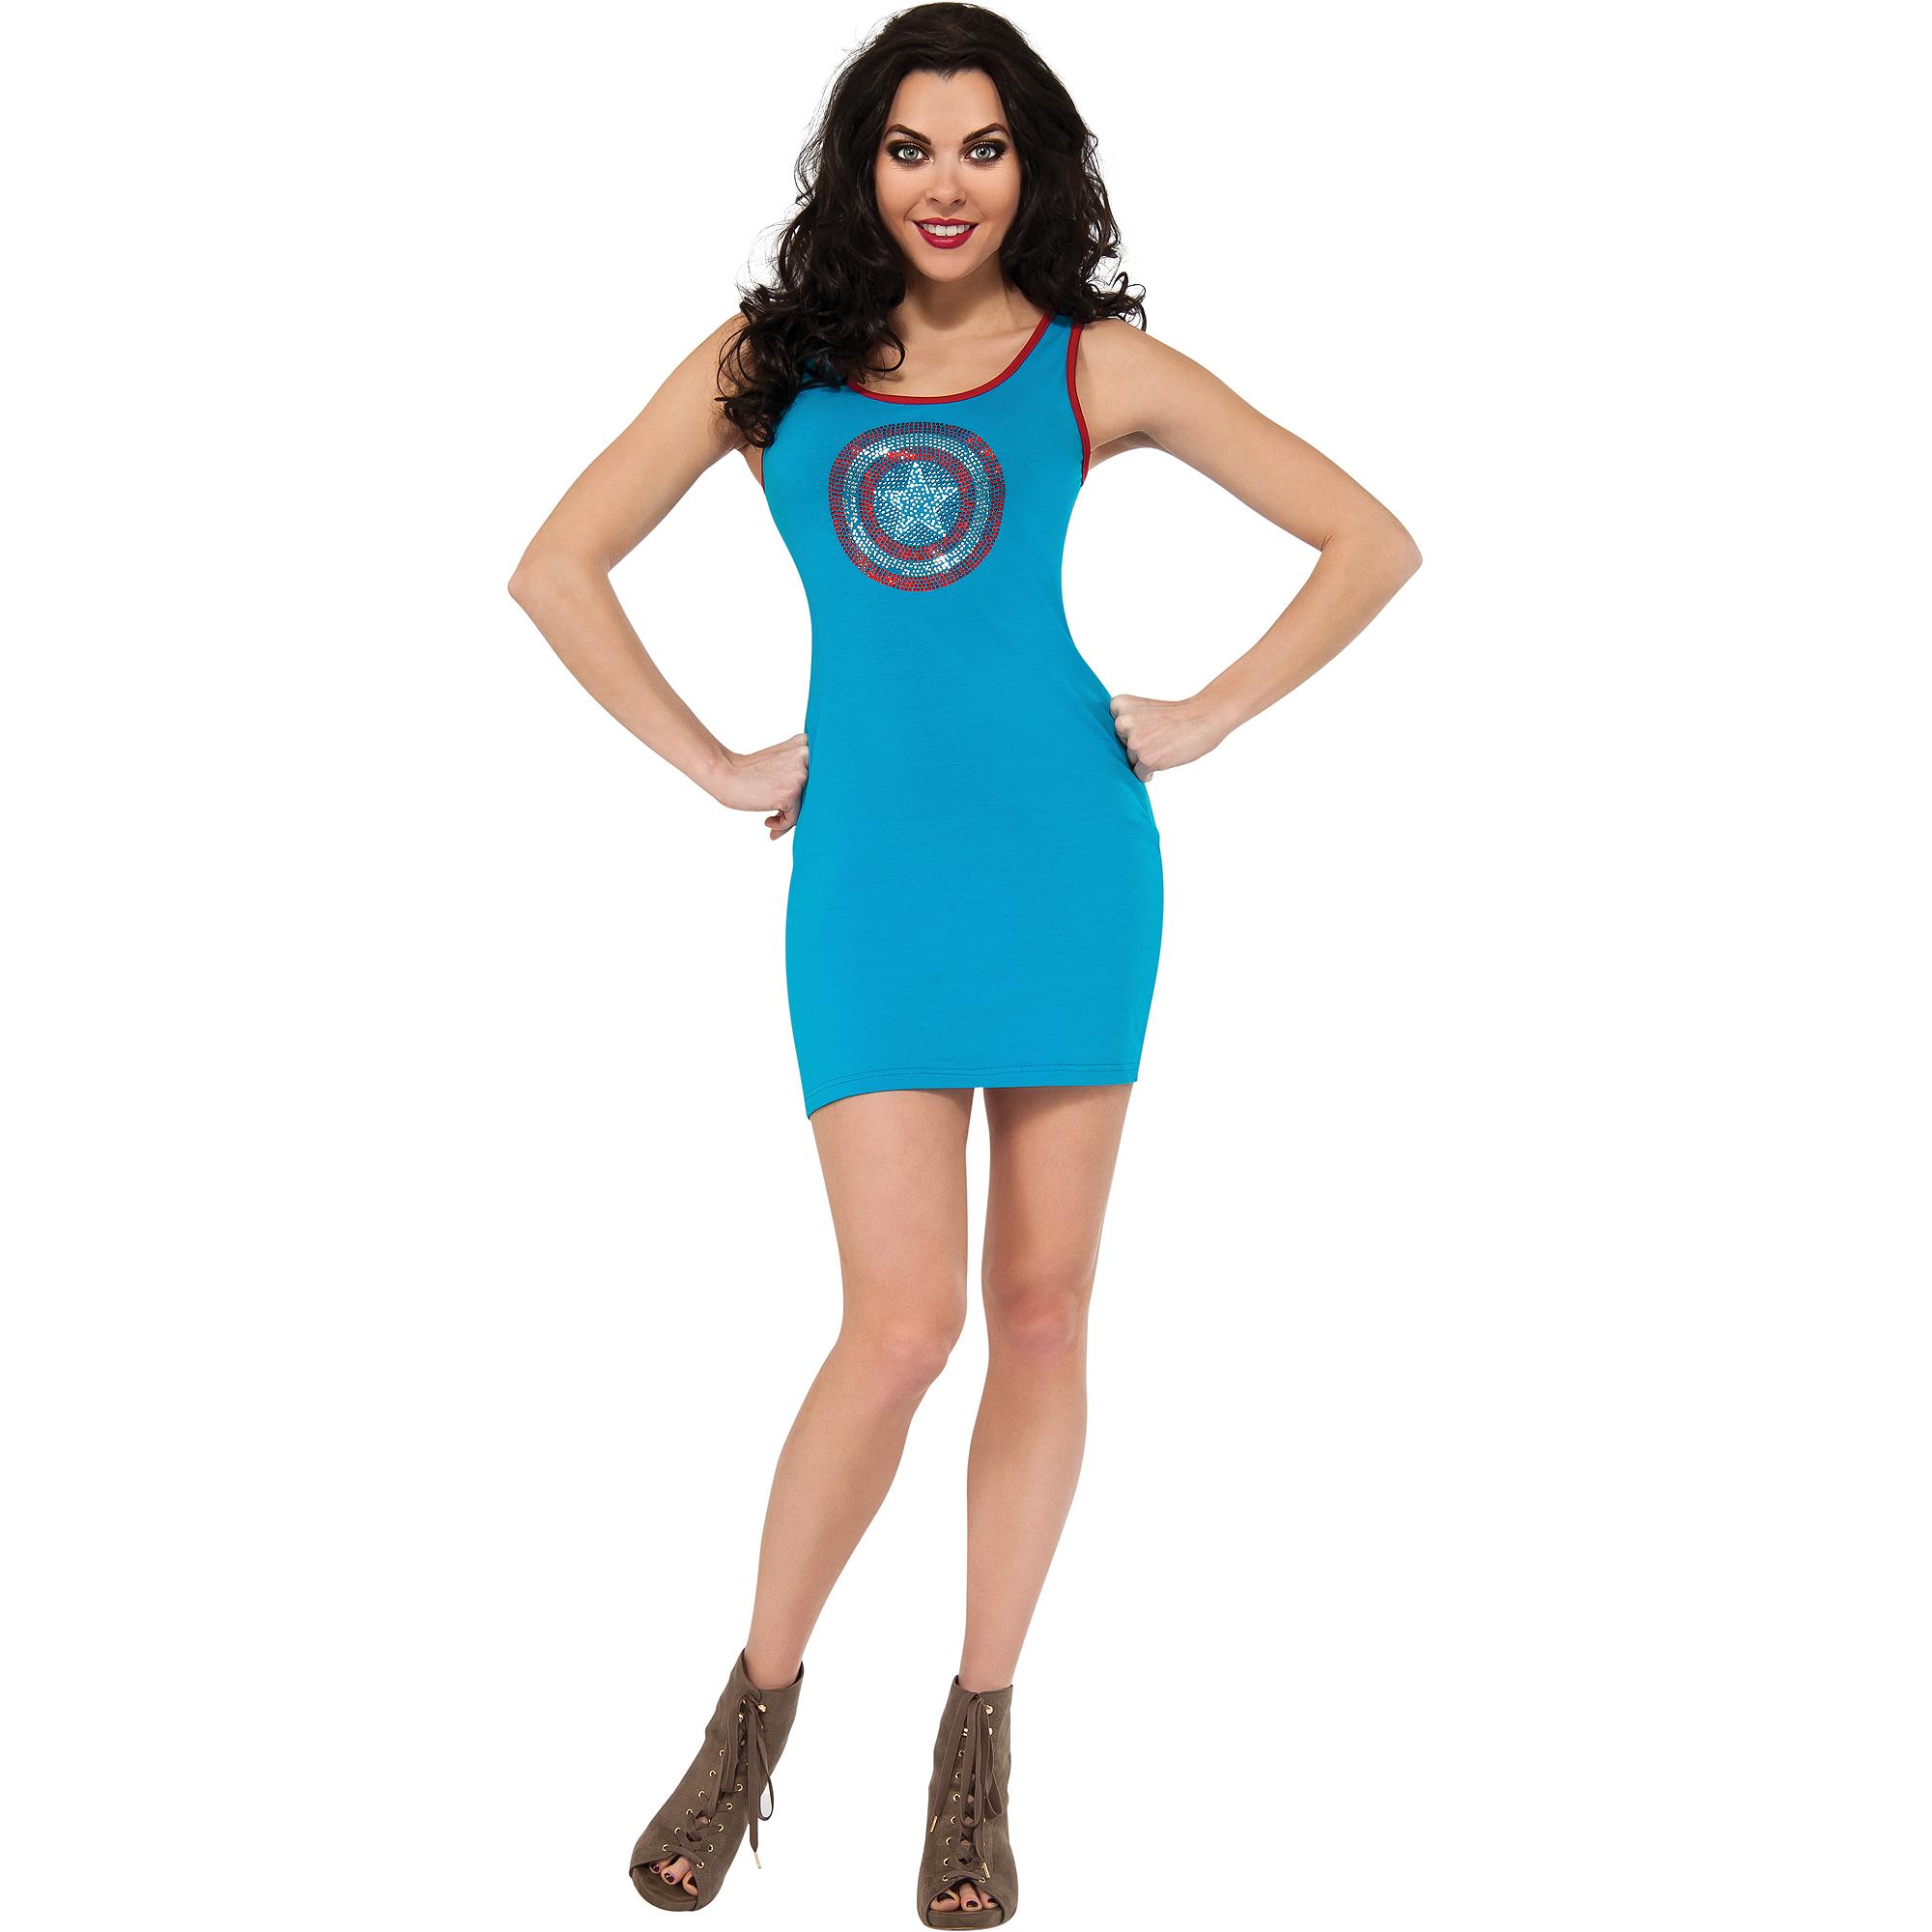 Captain American Rhinestone Tank Dress Adult Halloween Costume